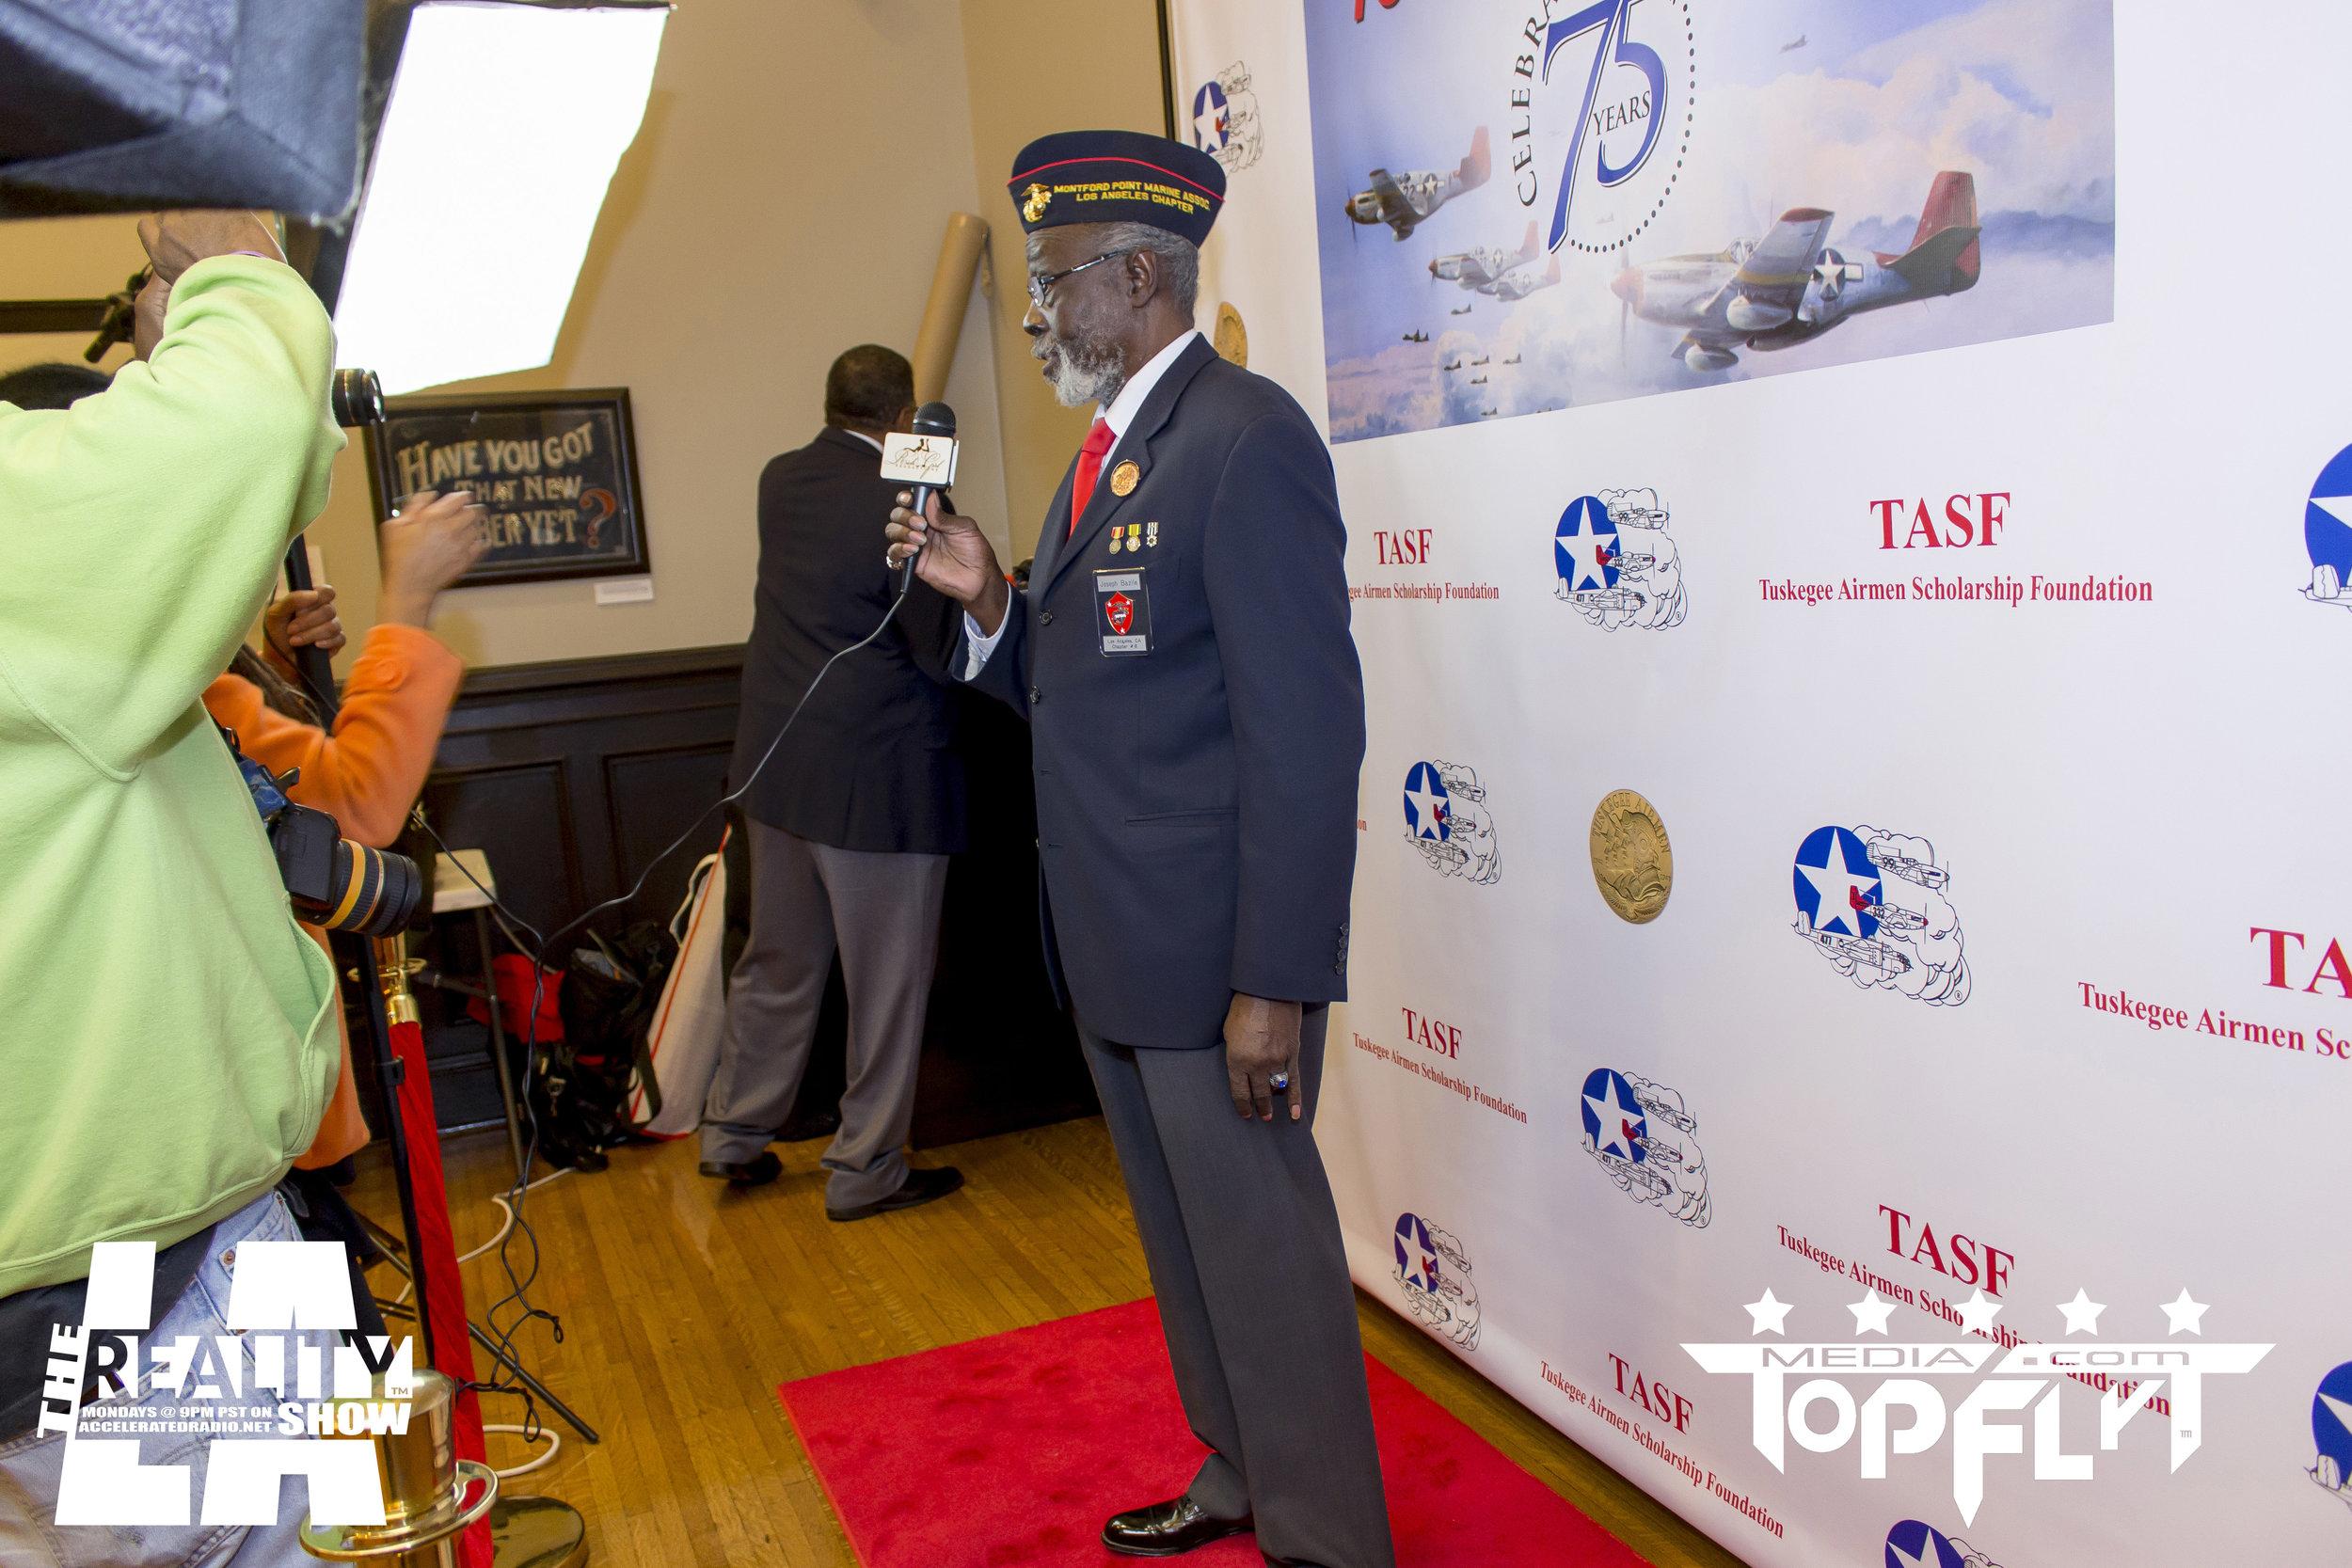 The Reality Show LA - Tuskegee Airmen 75th Anniversary VIP Reception_3.jpg